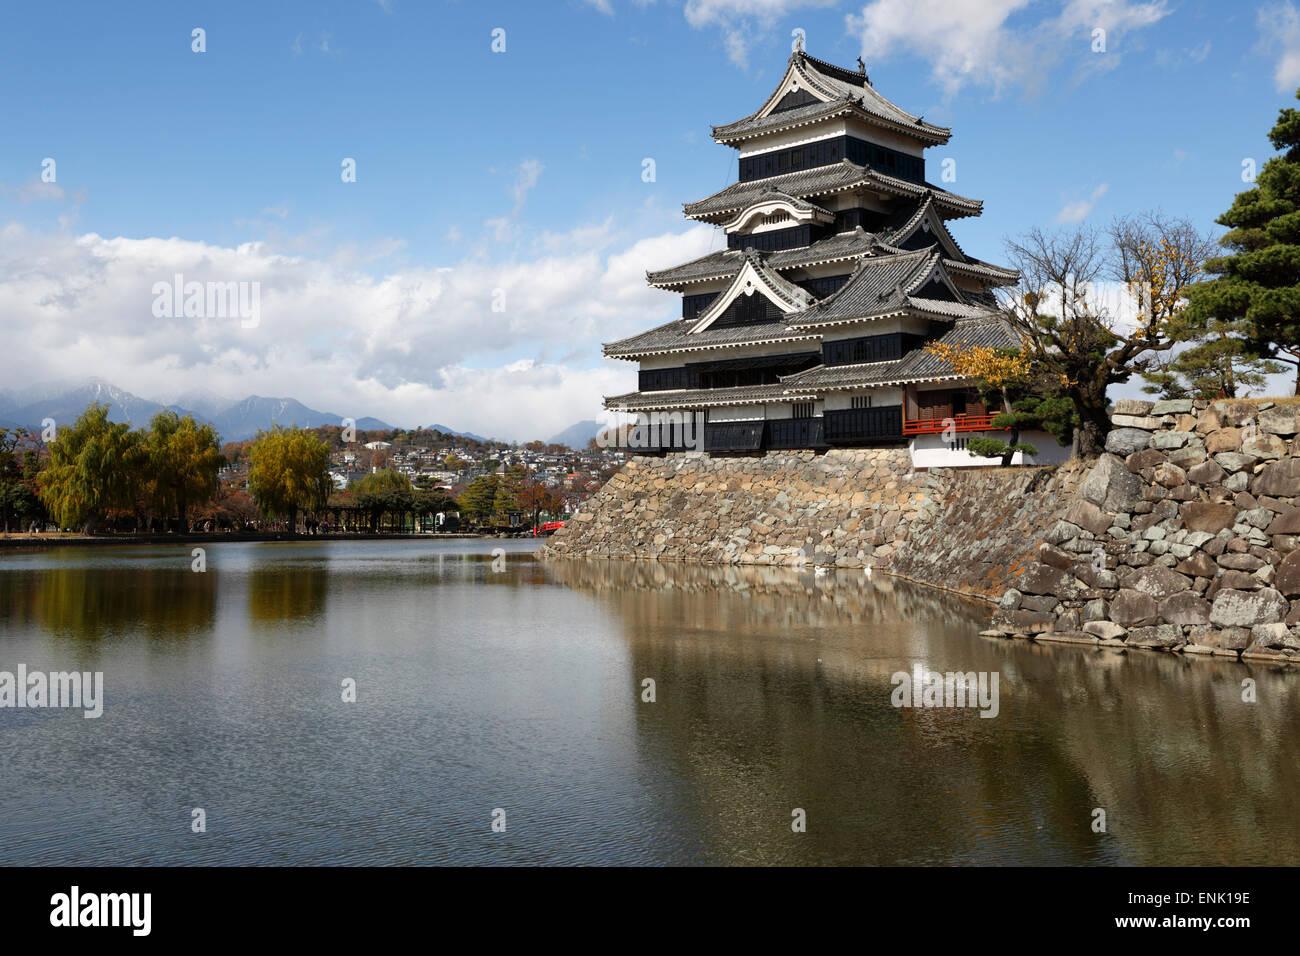 Matsumoto-Jo (hölzerne Burg), Matsumoto, zentralen Honshu, Japan, Asien Stockbild